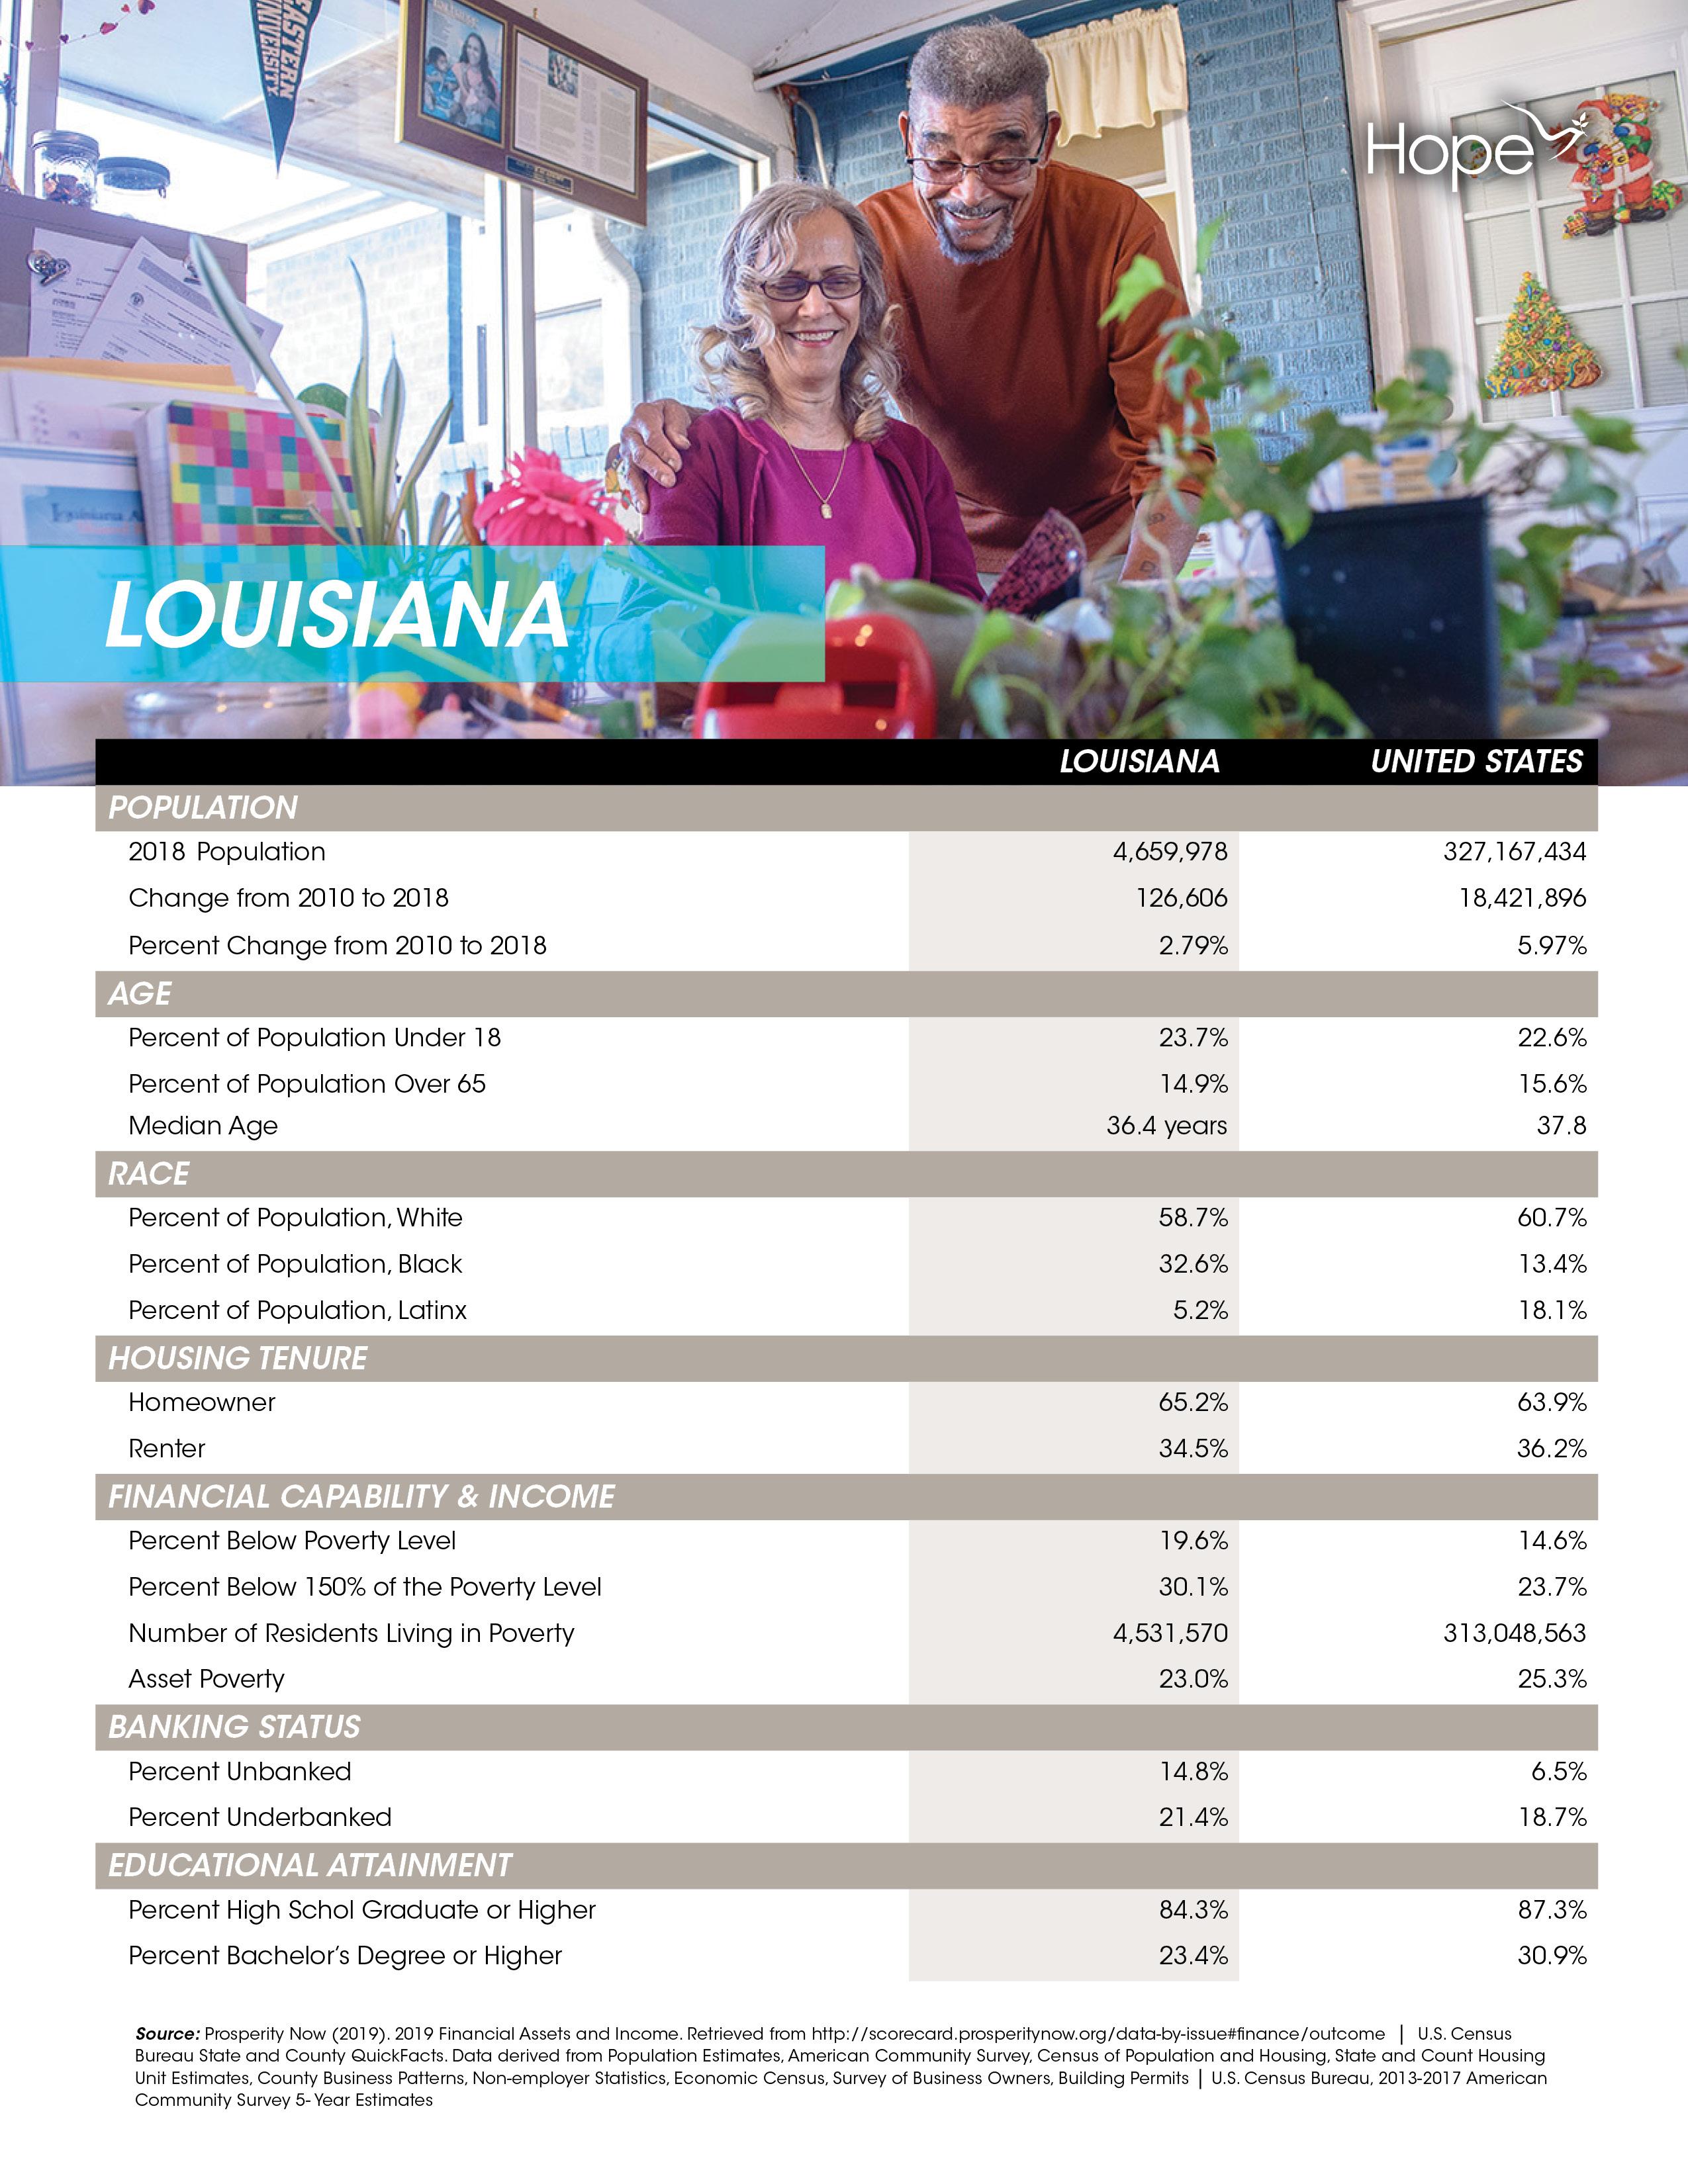 Louisiana - State Profiles